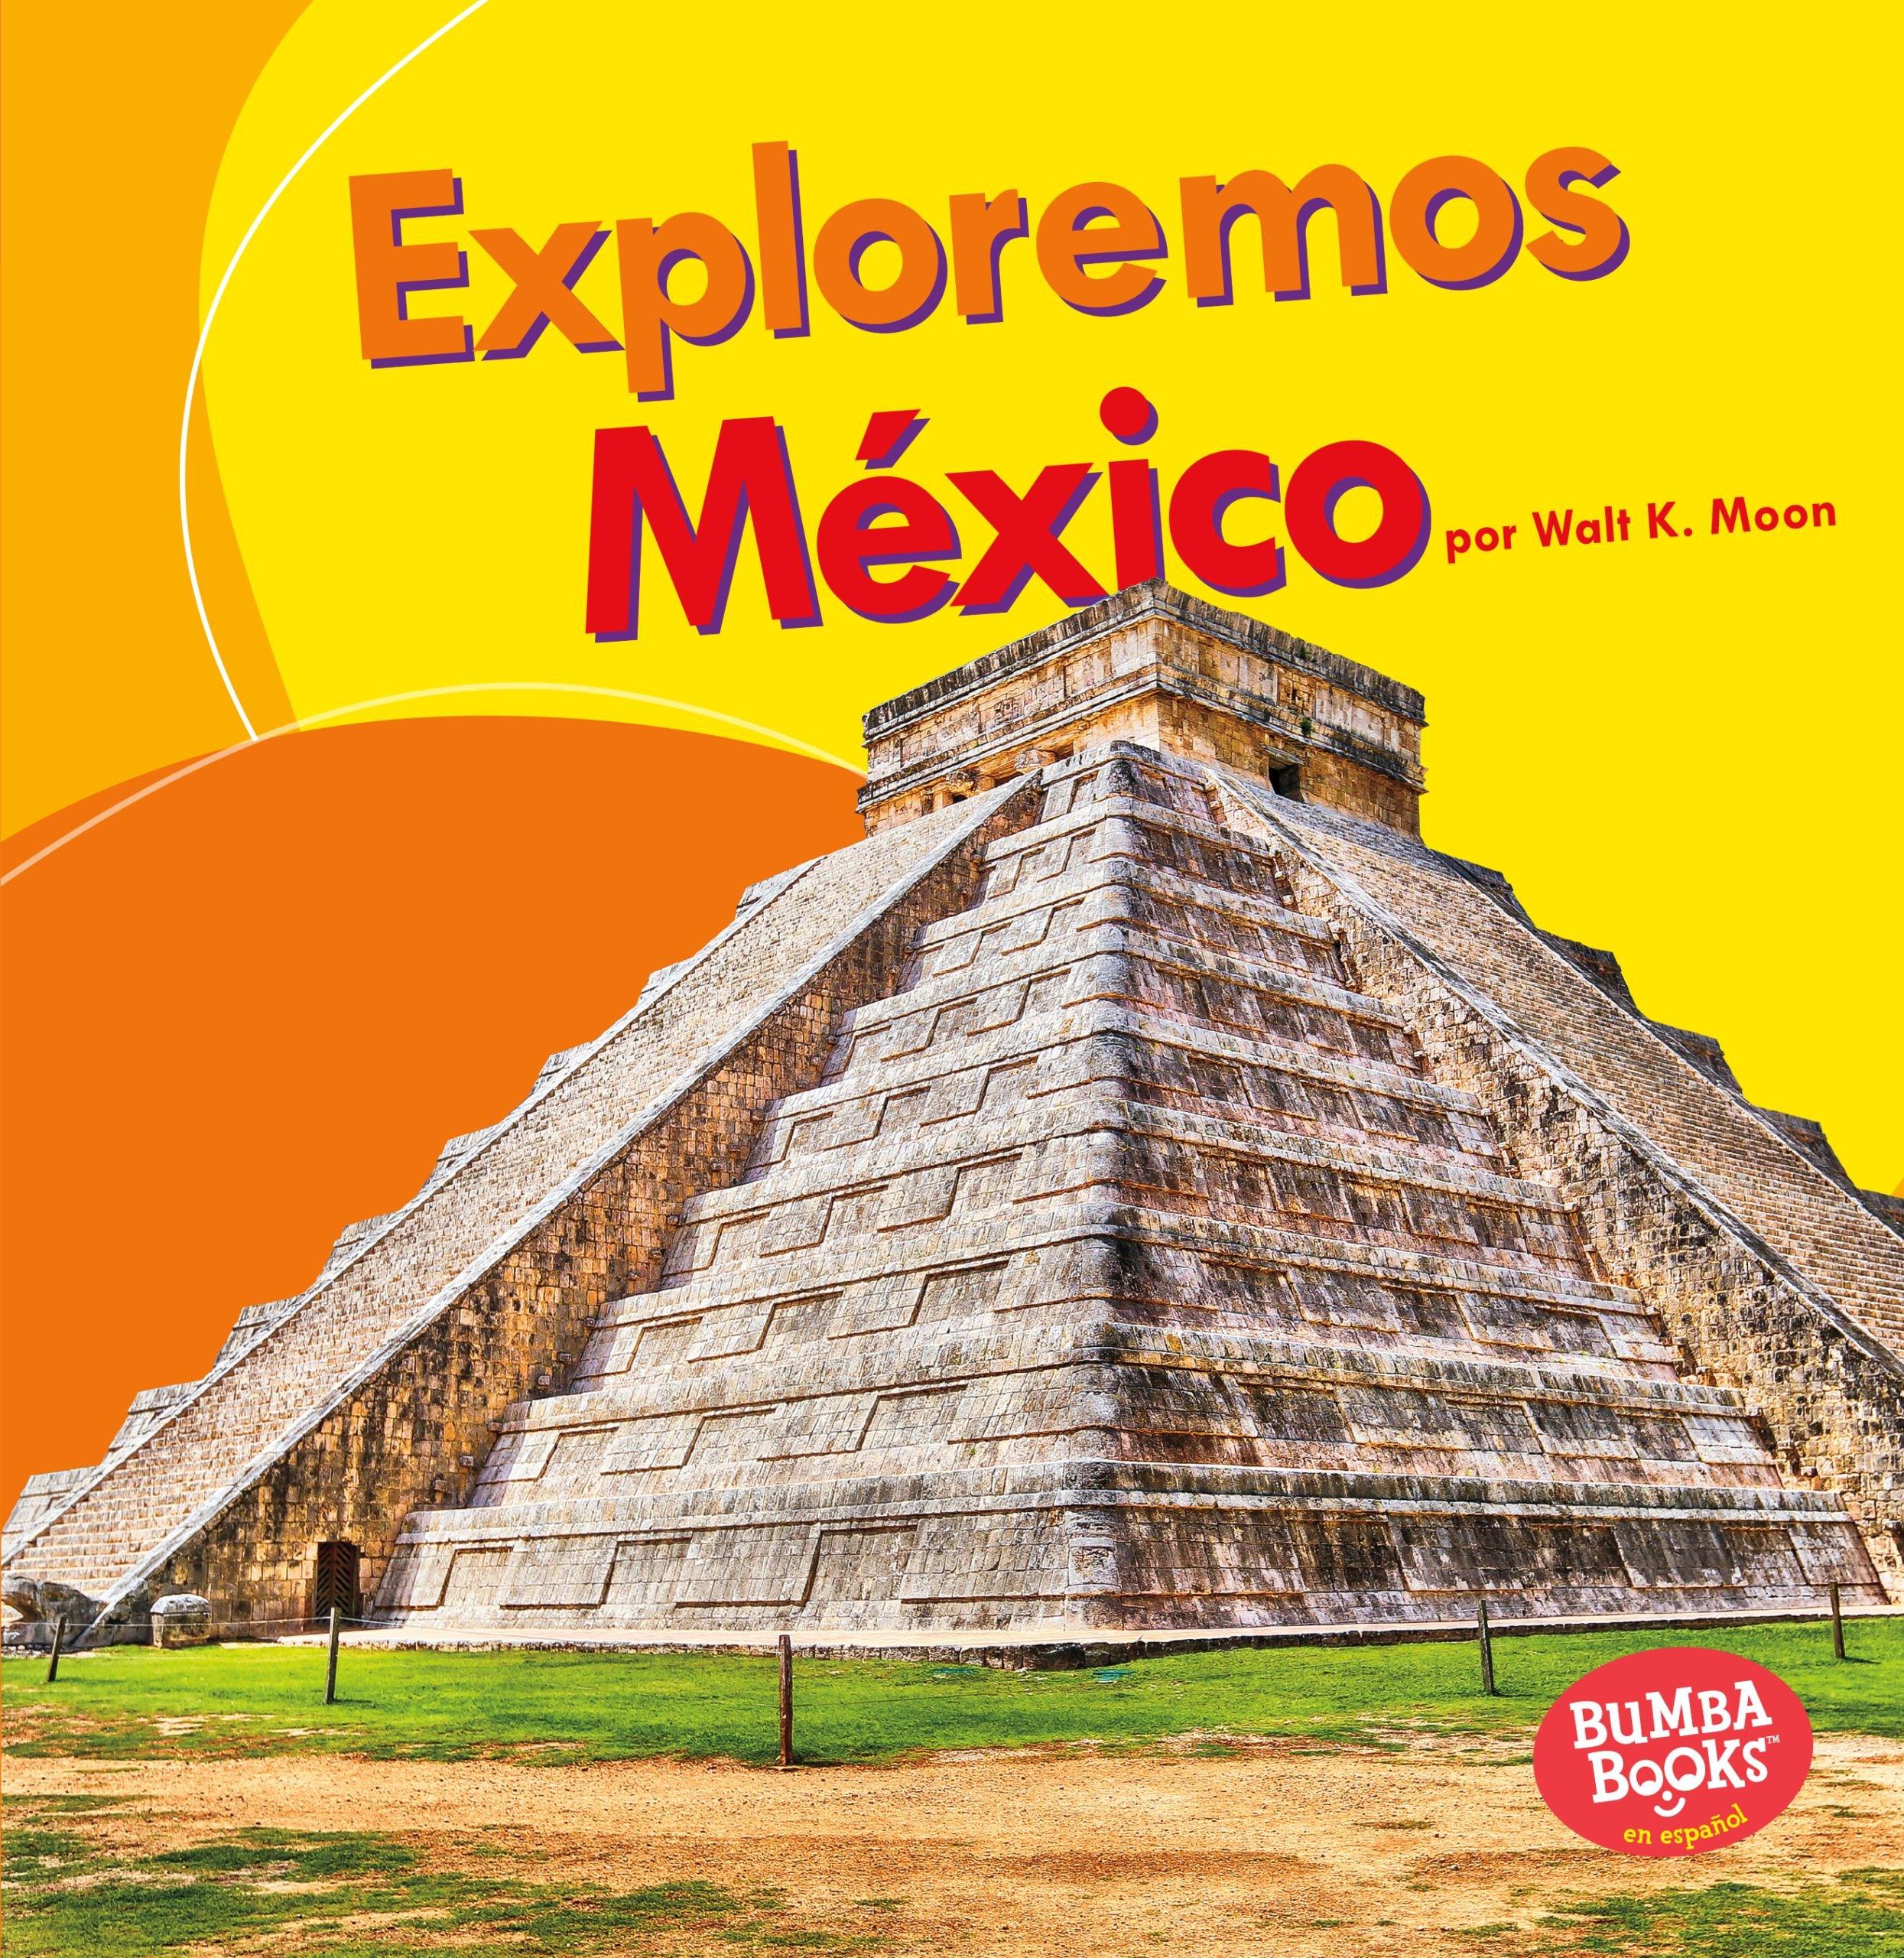 Exploremos México/Let's Explore Mexico (Exploremos Países/Let's Explore Countries) (Spanish Edition) (Bumba Books en espanol: Exploremos países/Let's Explore Countries)